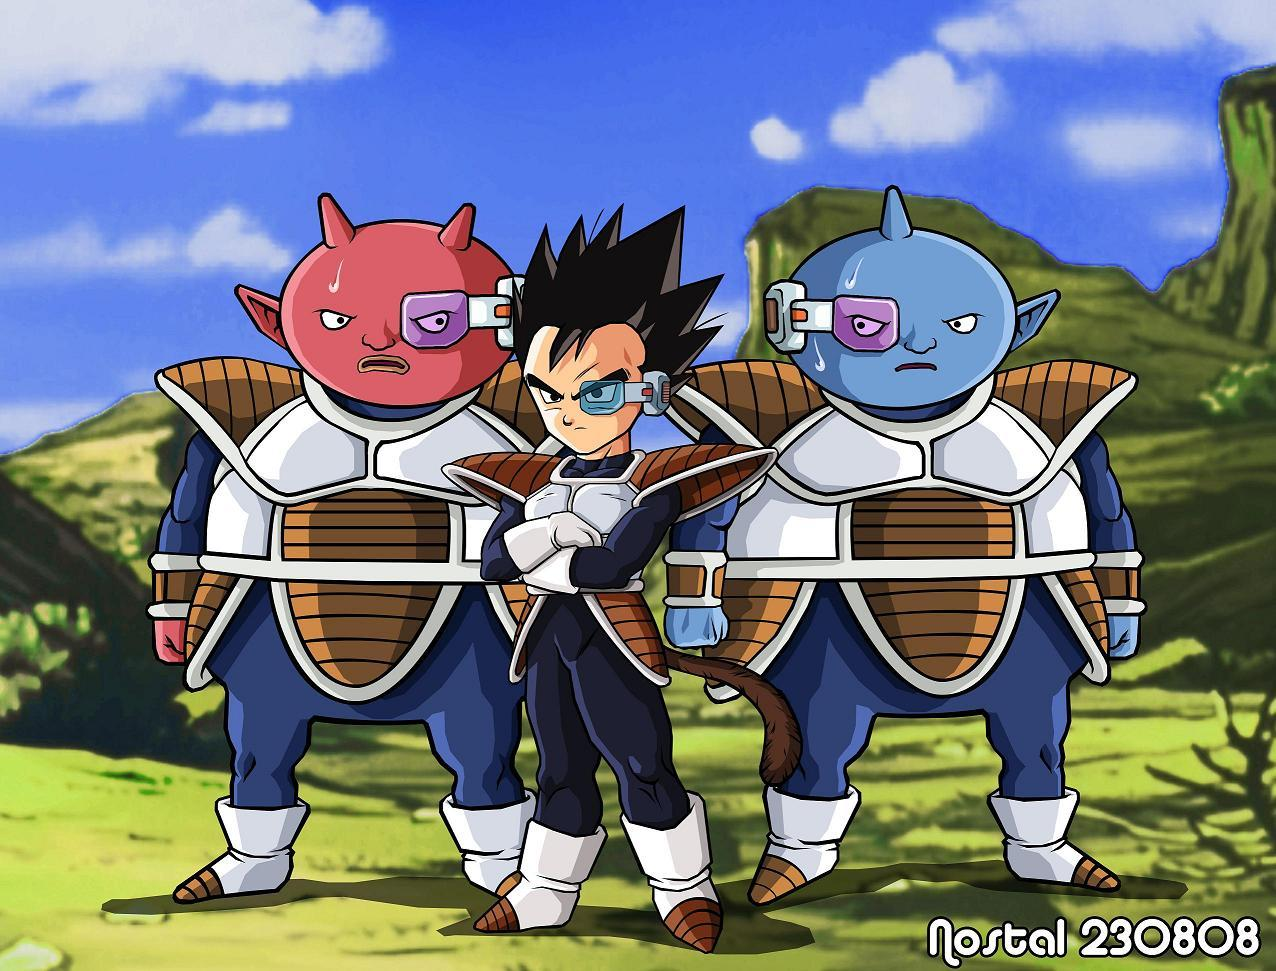 http://2.bp.blogspot.com/_bq9TcMaVMGw/TSNFFc7sPnI/AAAAAAAAFDU/HnmtU8IA2ZU/s1600/dragon+ball+2008.JPG